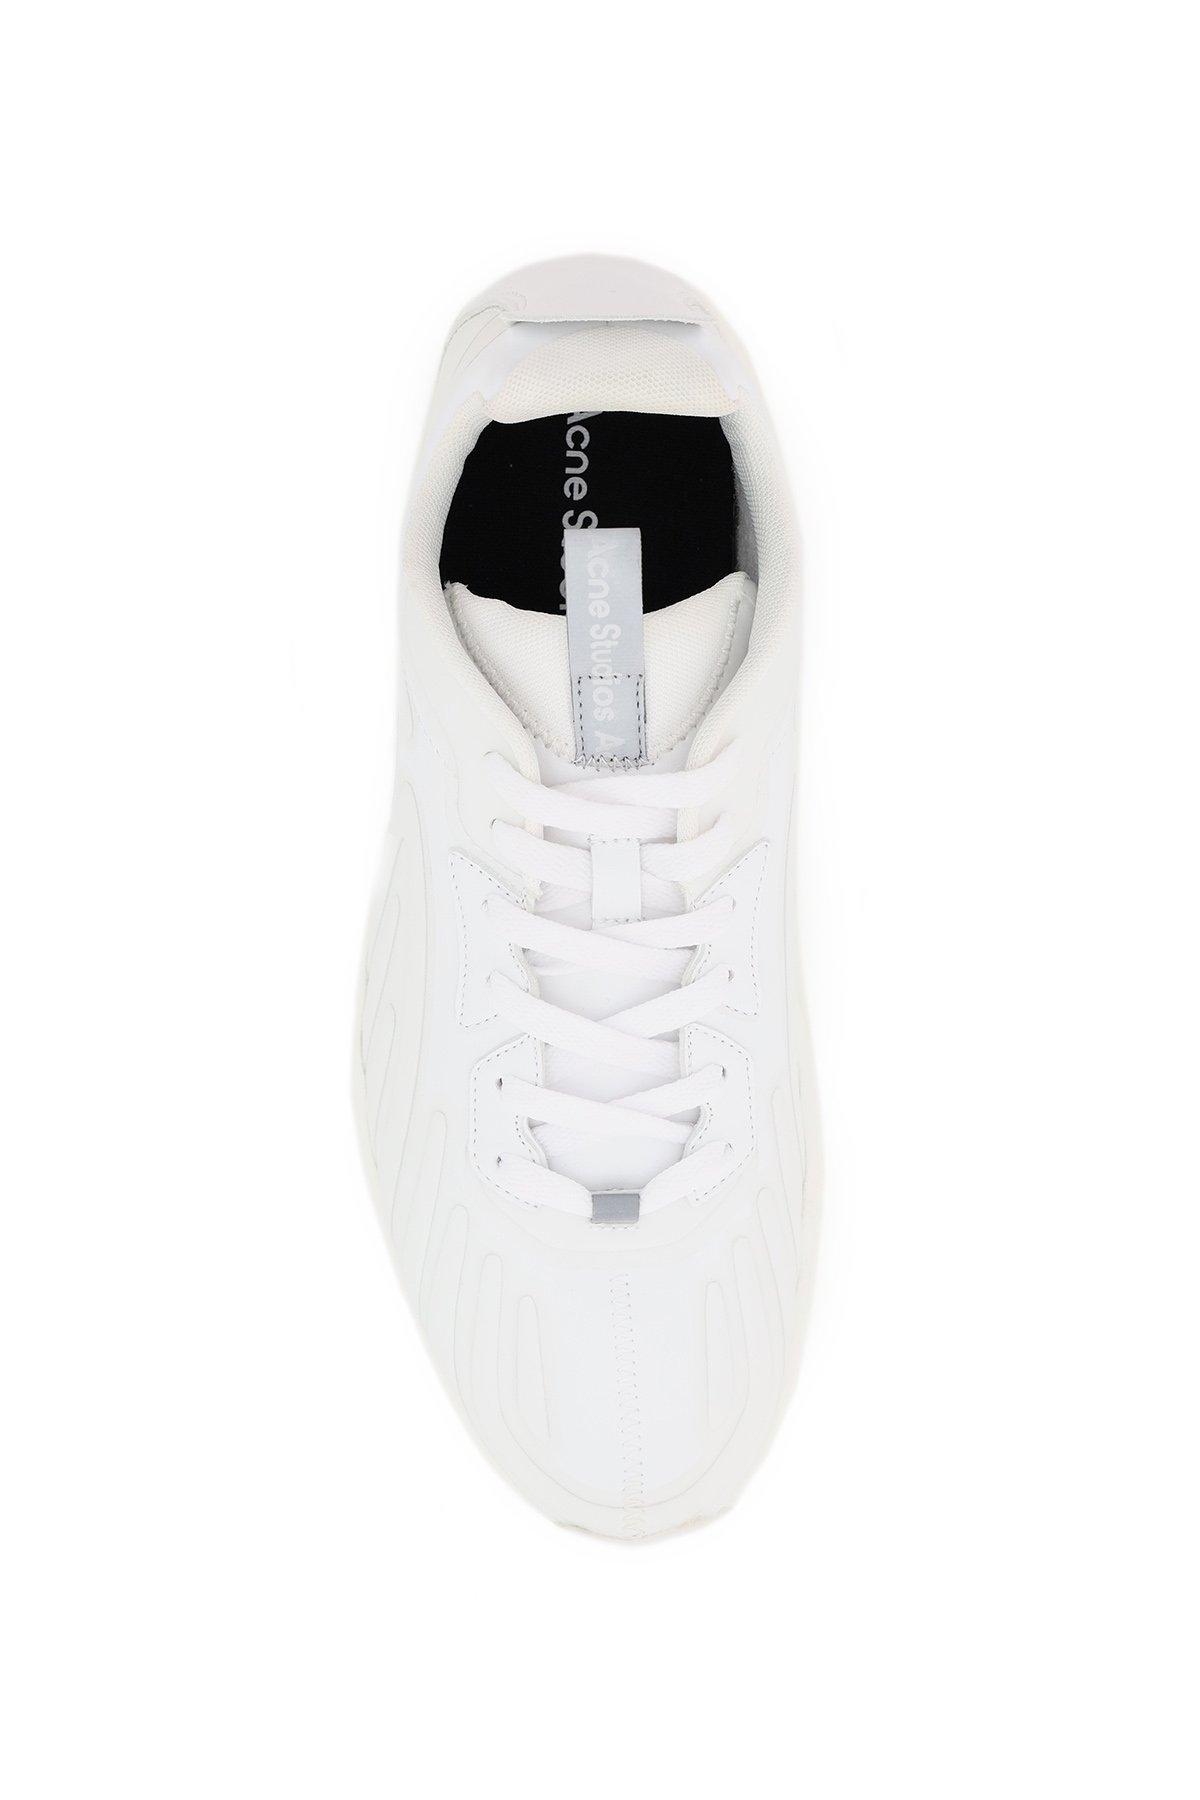 Acne studios sneakers trainer